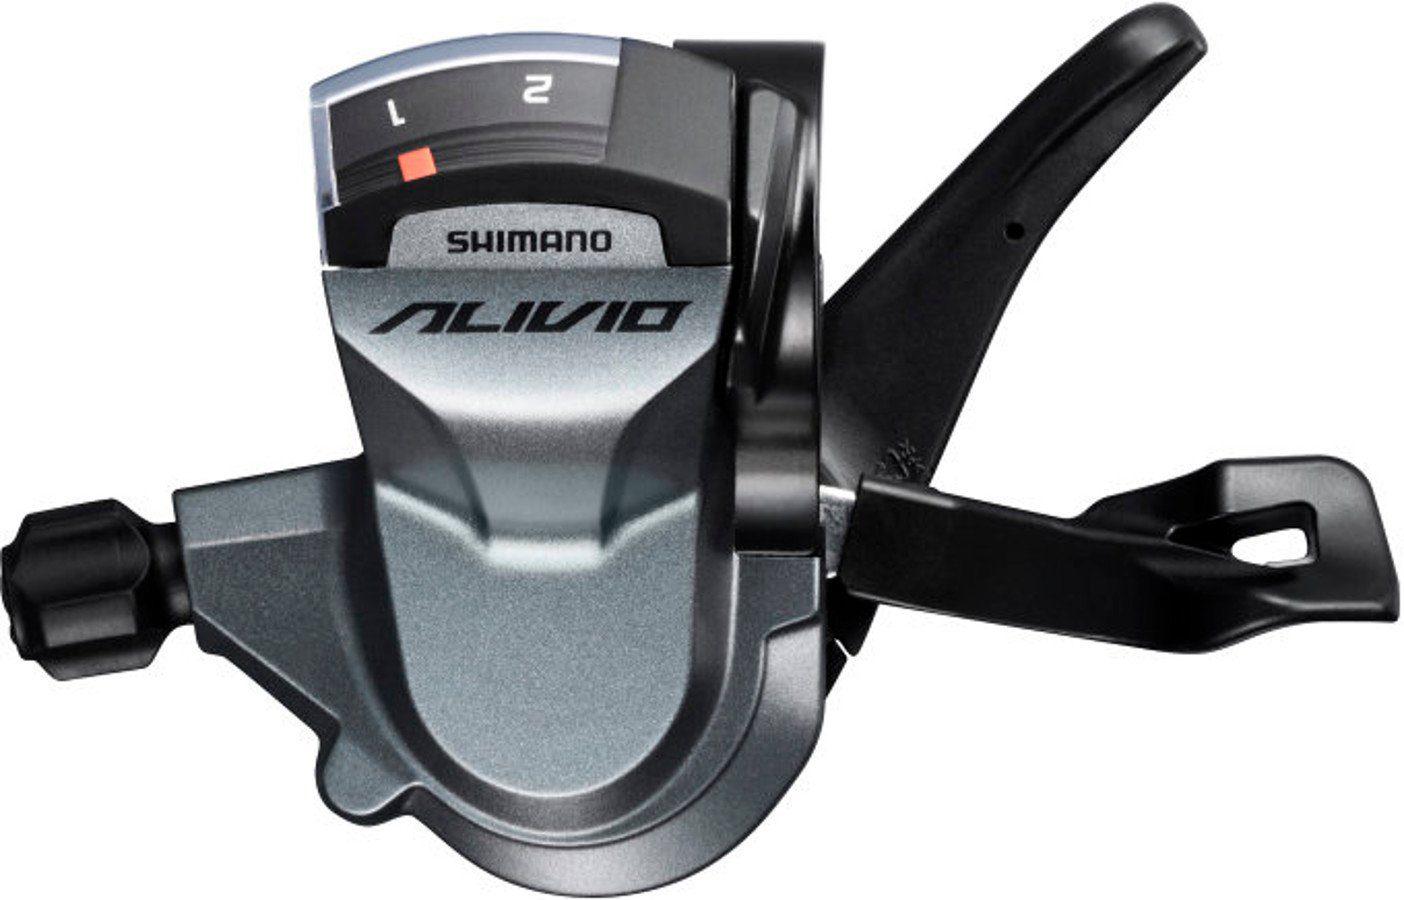 Shimano Schaltung »Alivio SL-M4010 Schalthebel 2-fach«